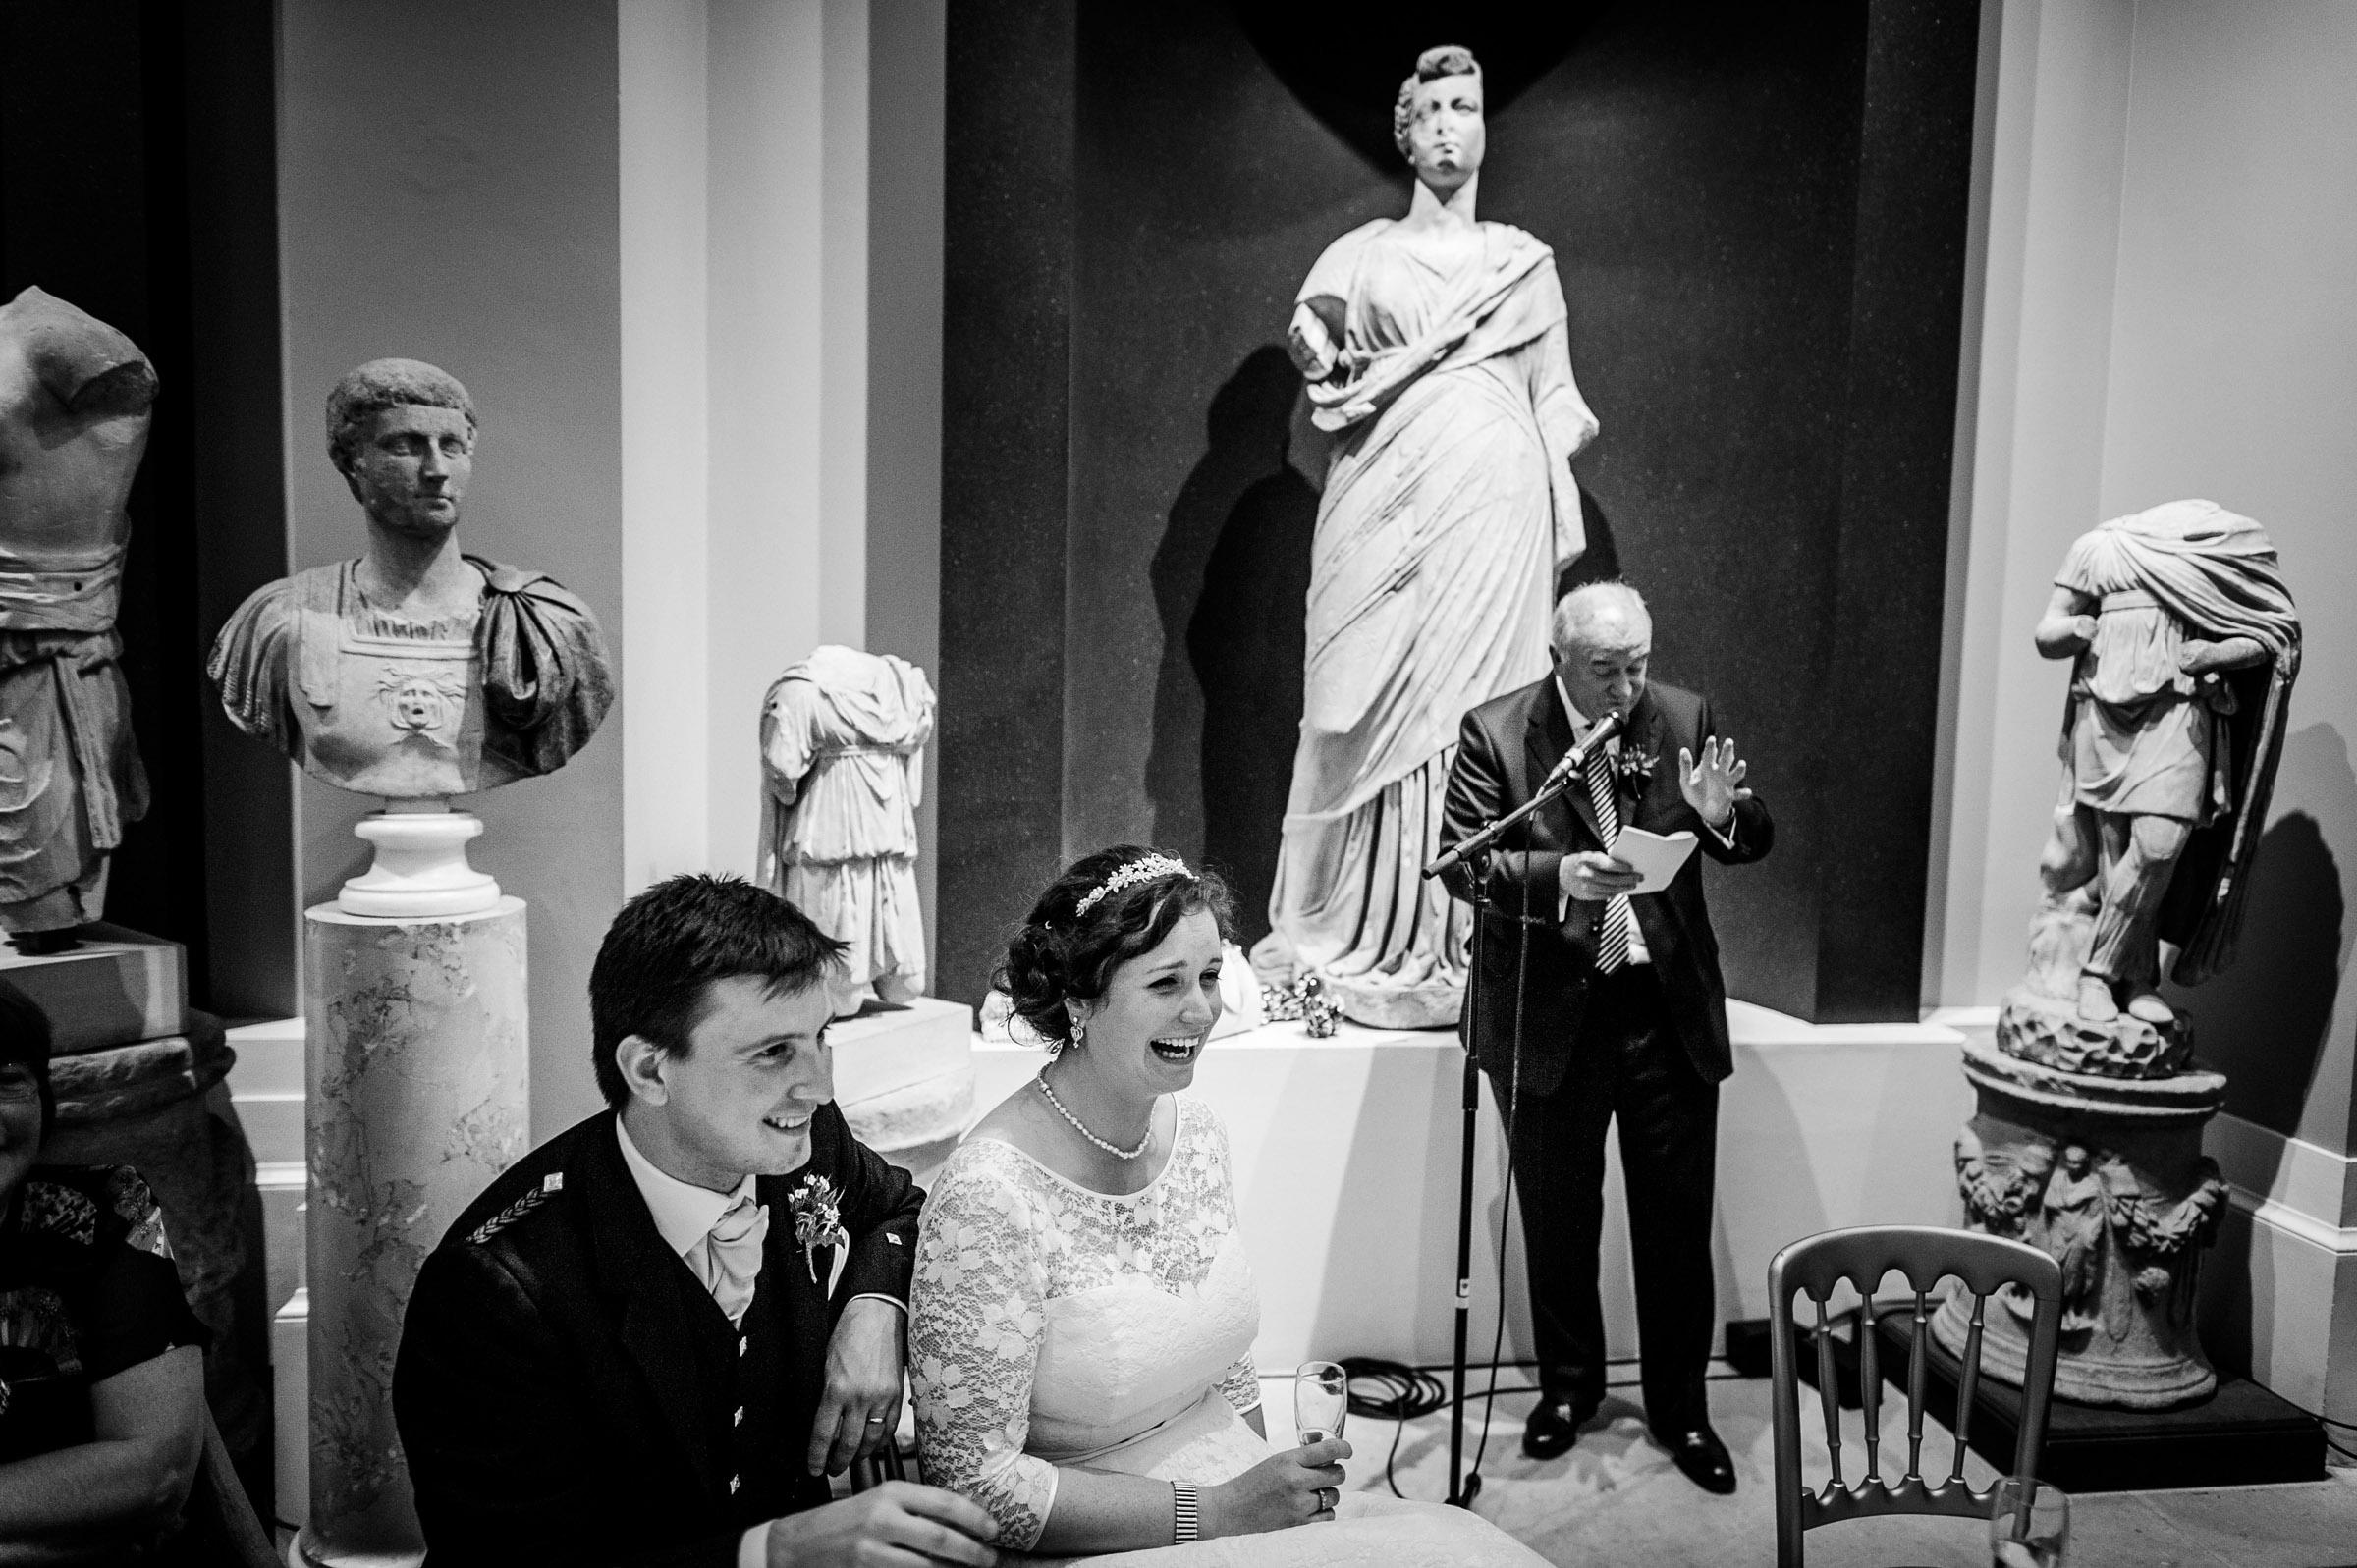 Ashmolean-Museum-Wedding-Pictures-0066.jpg